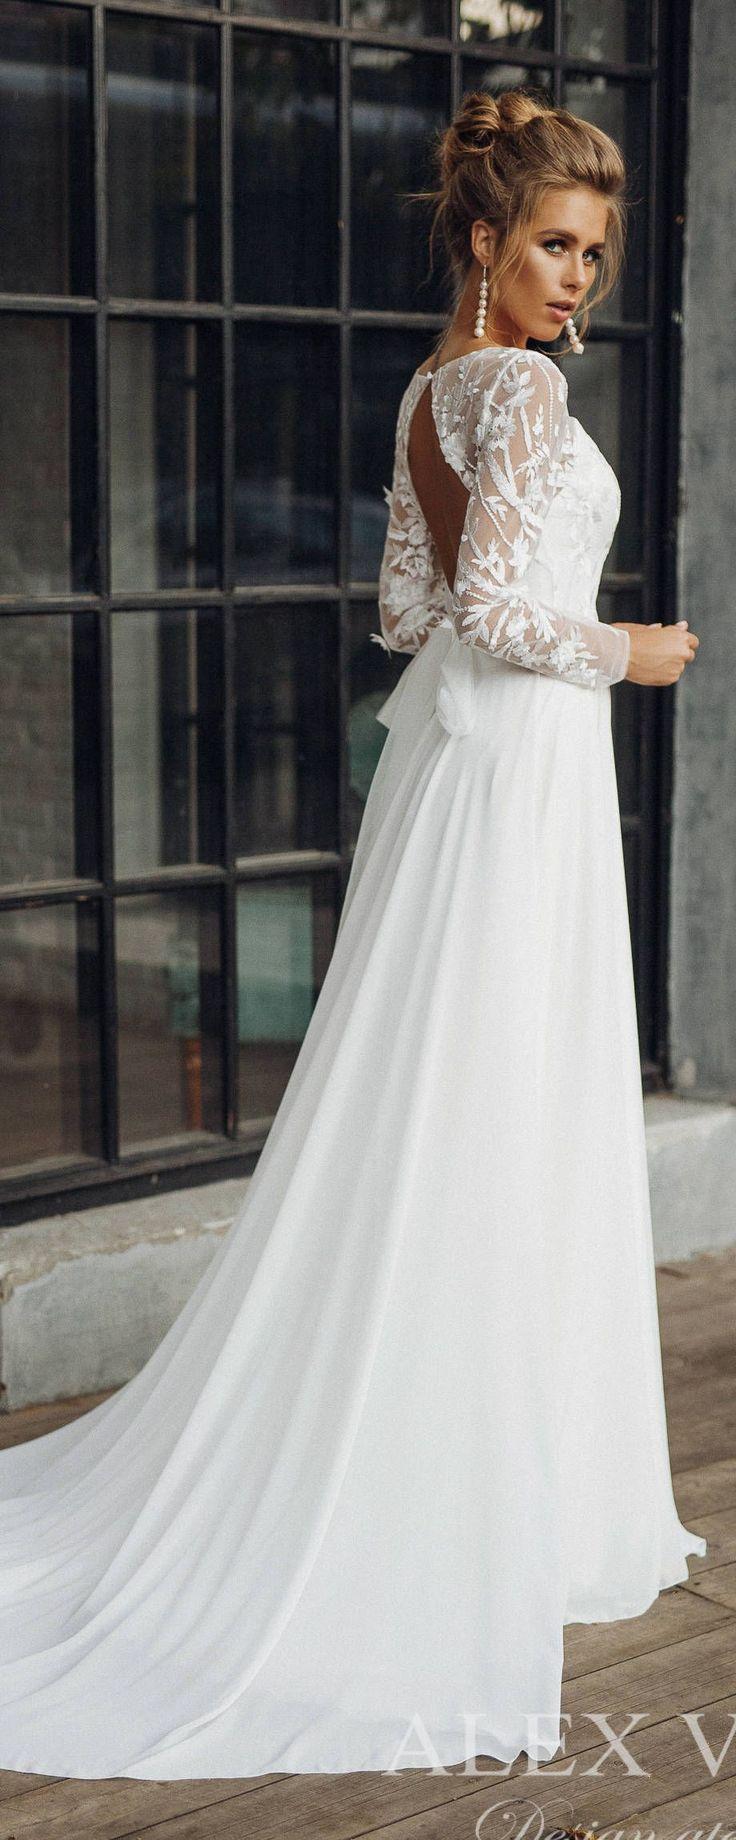 1440 best brautkleid images on Pinterest | Bridal dresses, Bridal ...